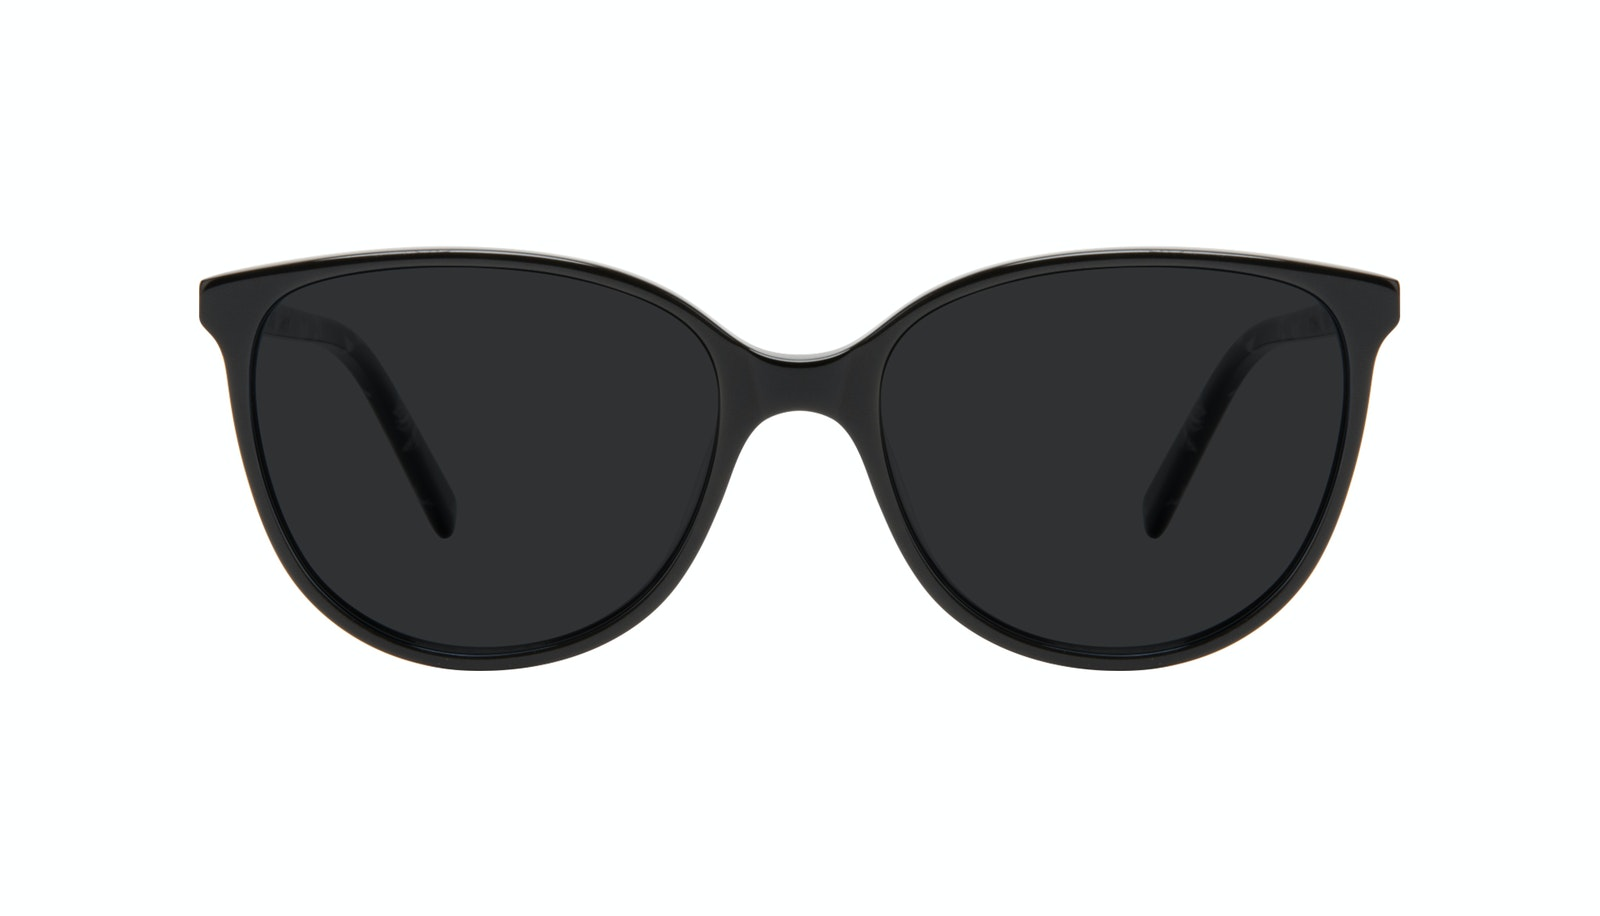 Affordable Fashion Glasses Round Sunglasses Women Imagine Petite Onyx